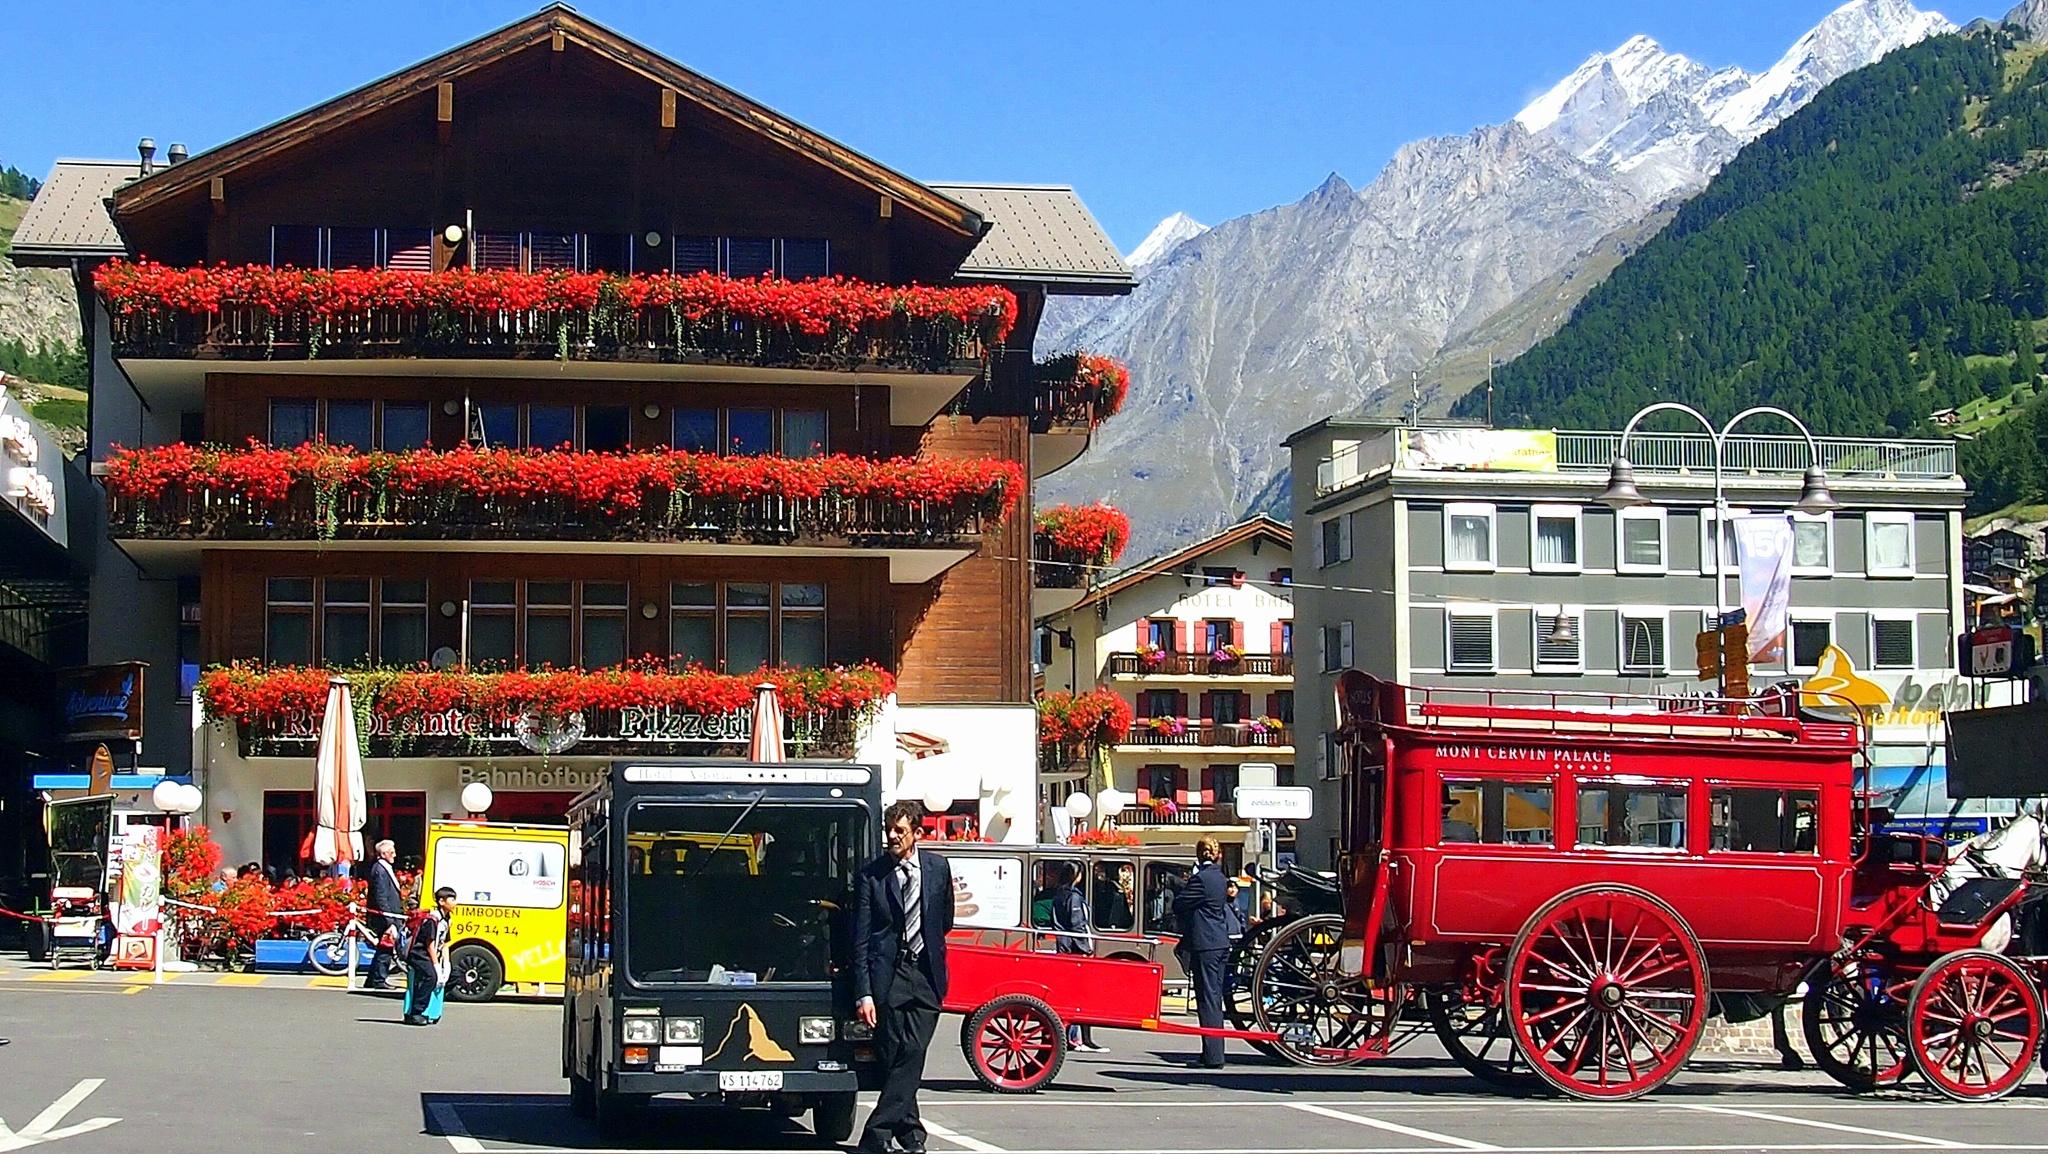 In Zermatt by Rudy Tarrazona Guacena